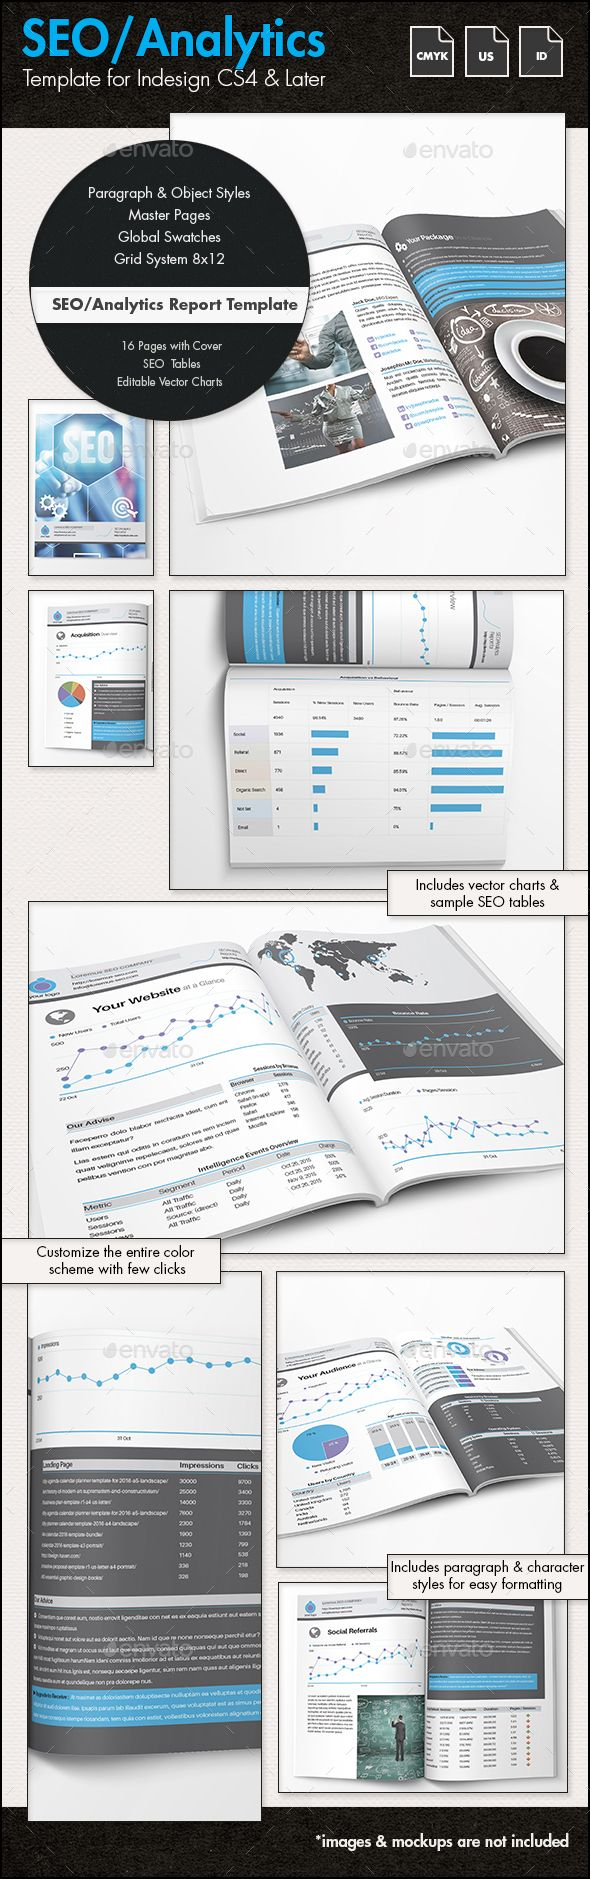 SEO Analytics Report / Proposal Template - US